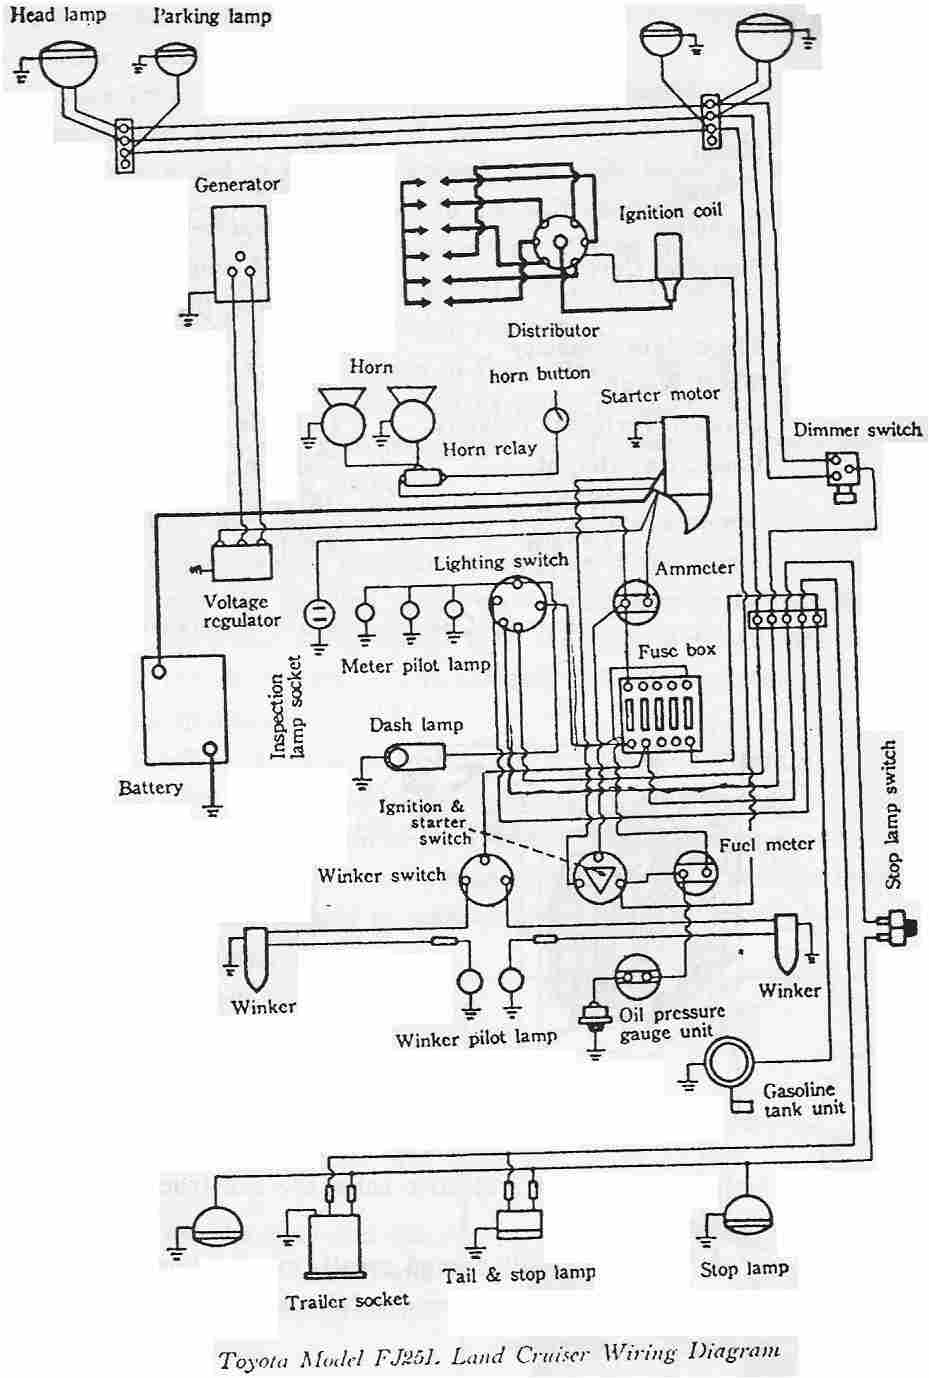 dual marine radio wiring diagram golf cart electrical system toyota land cruiser fj25 | all about diagrams